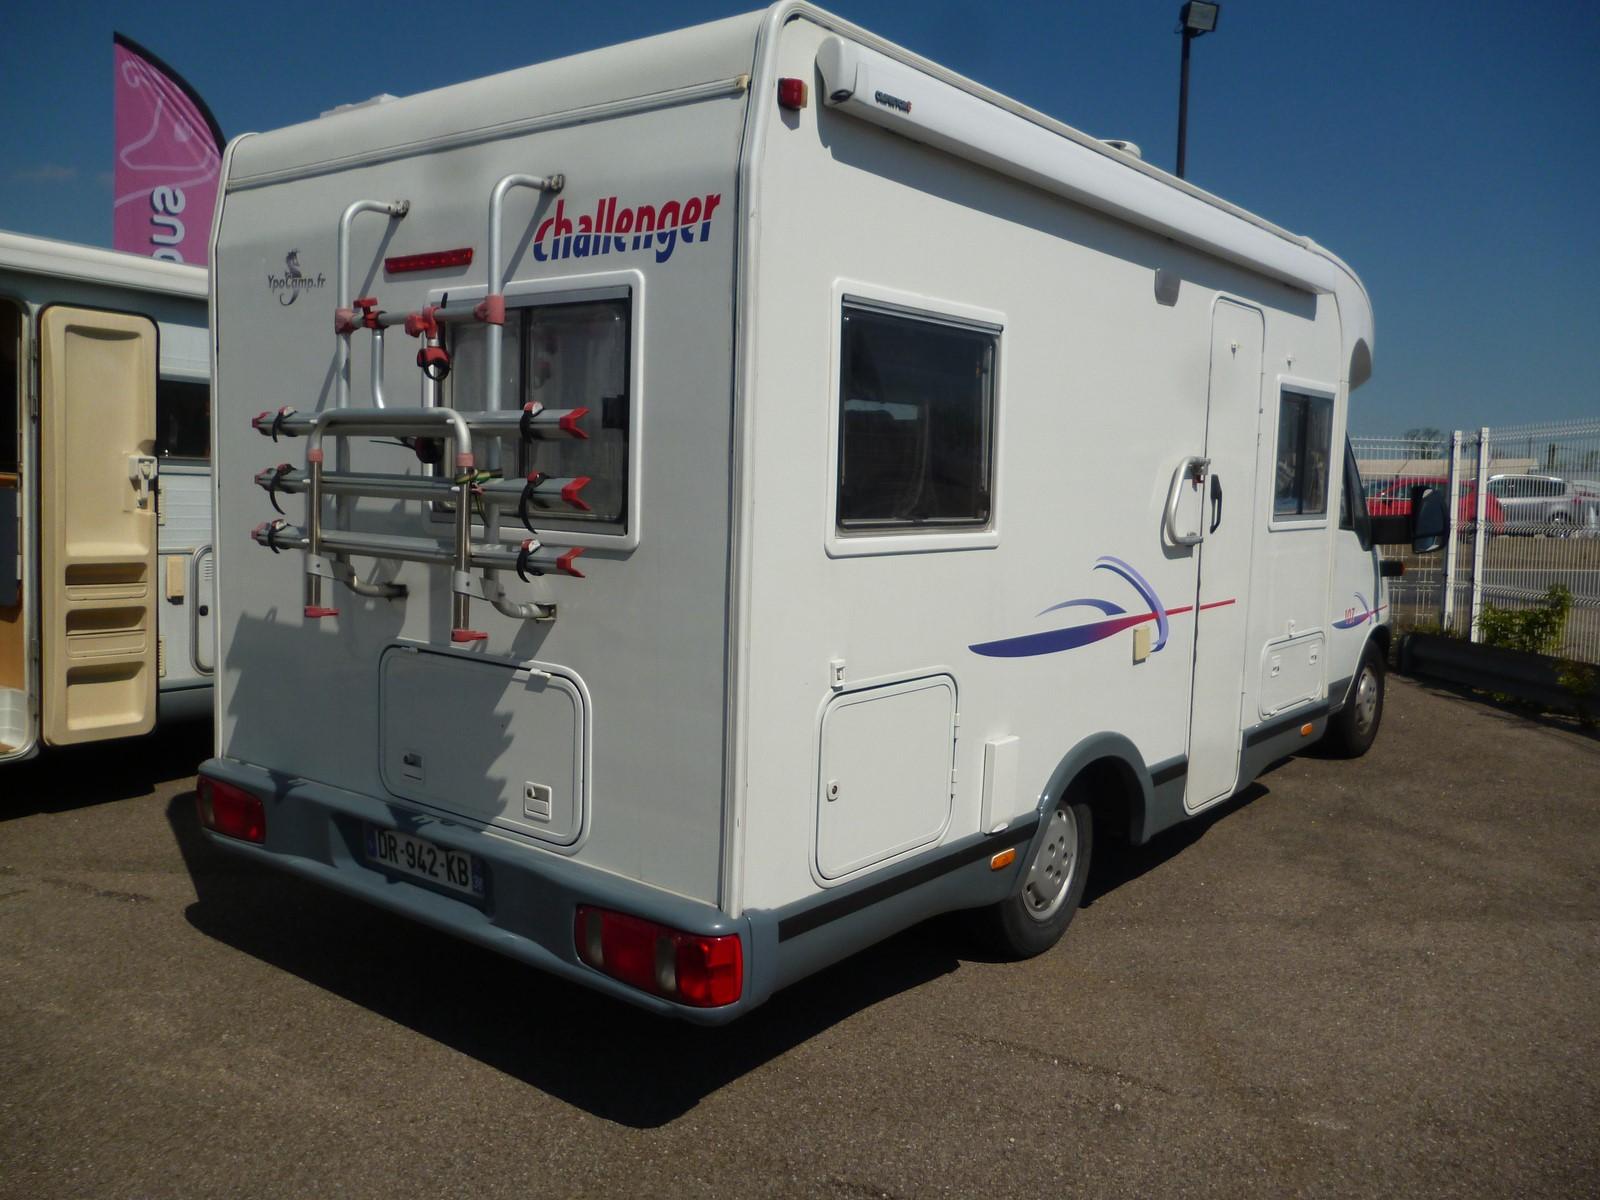 challenger 107 occasion de 2003 fiat camping car en vente saint priest rhone 69. Black Bedroom Furniture Sets. Home Design Ideas